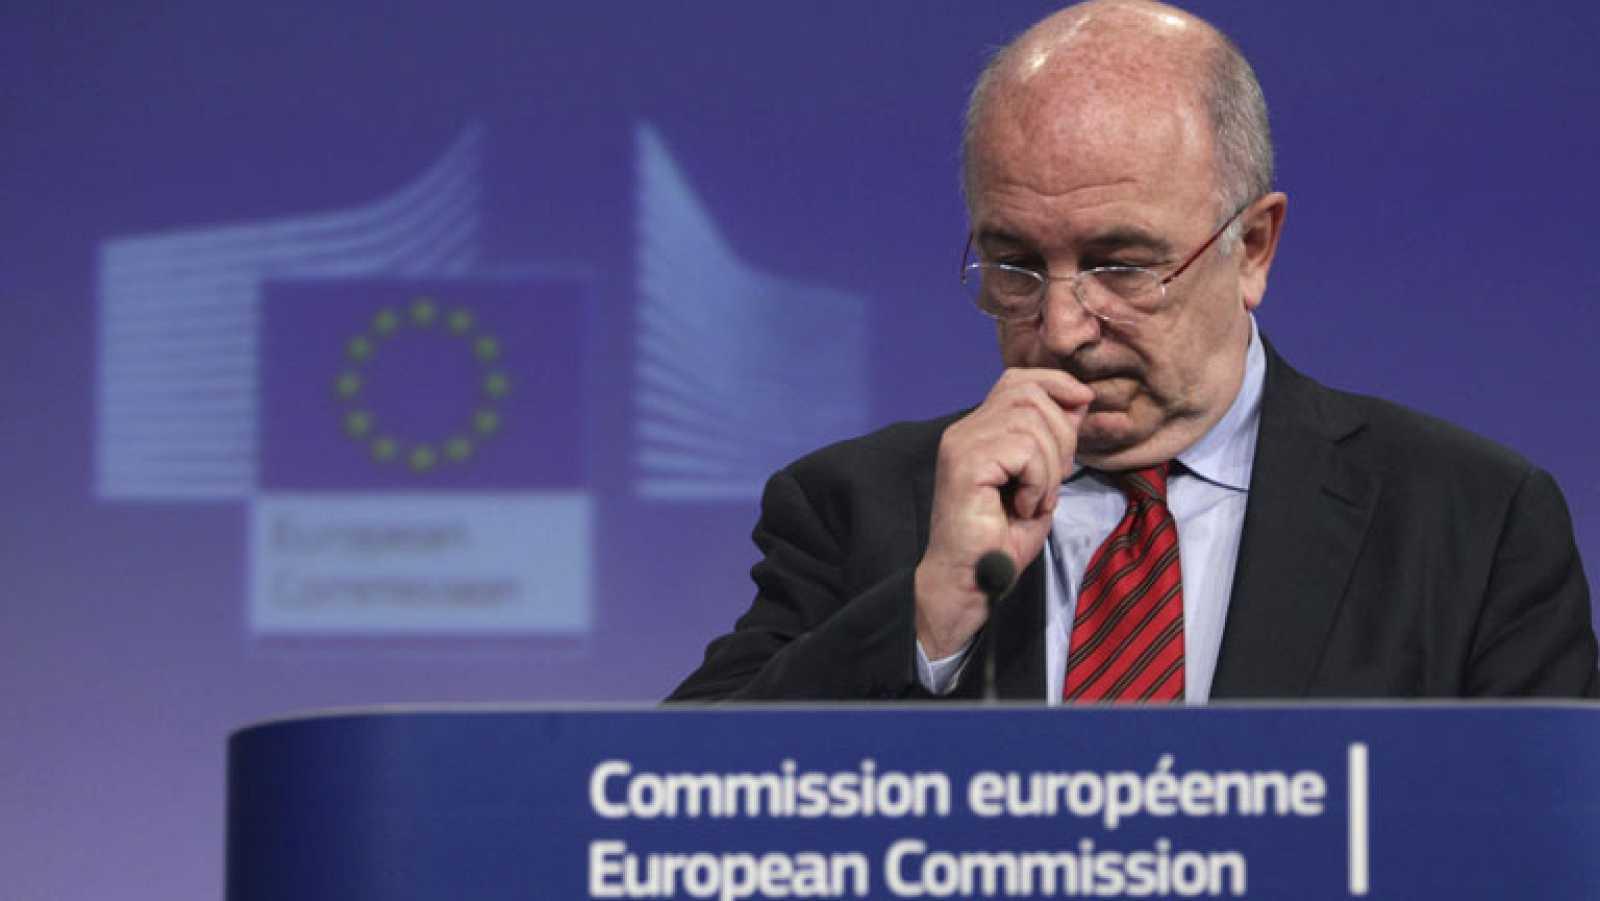 El coste total de la reestructuración bancaria suma 52.000 millones de euros